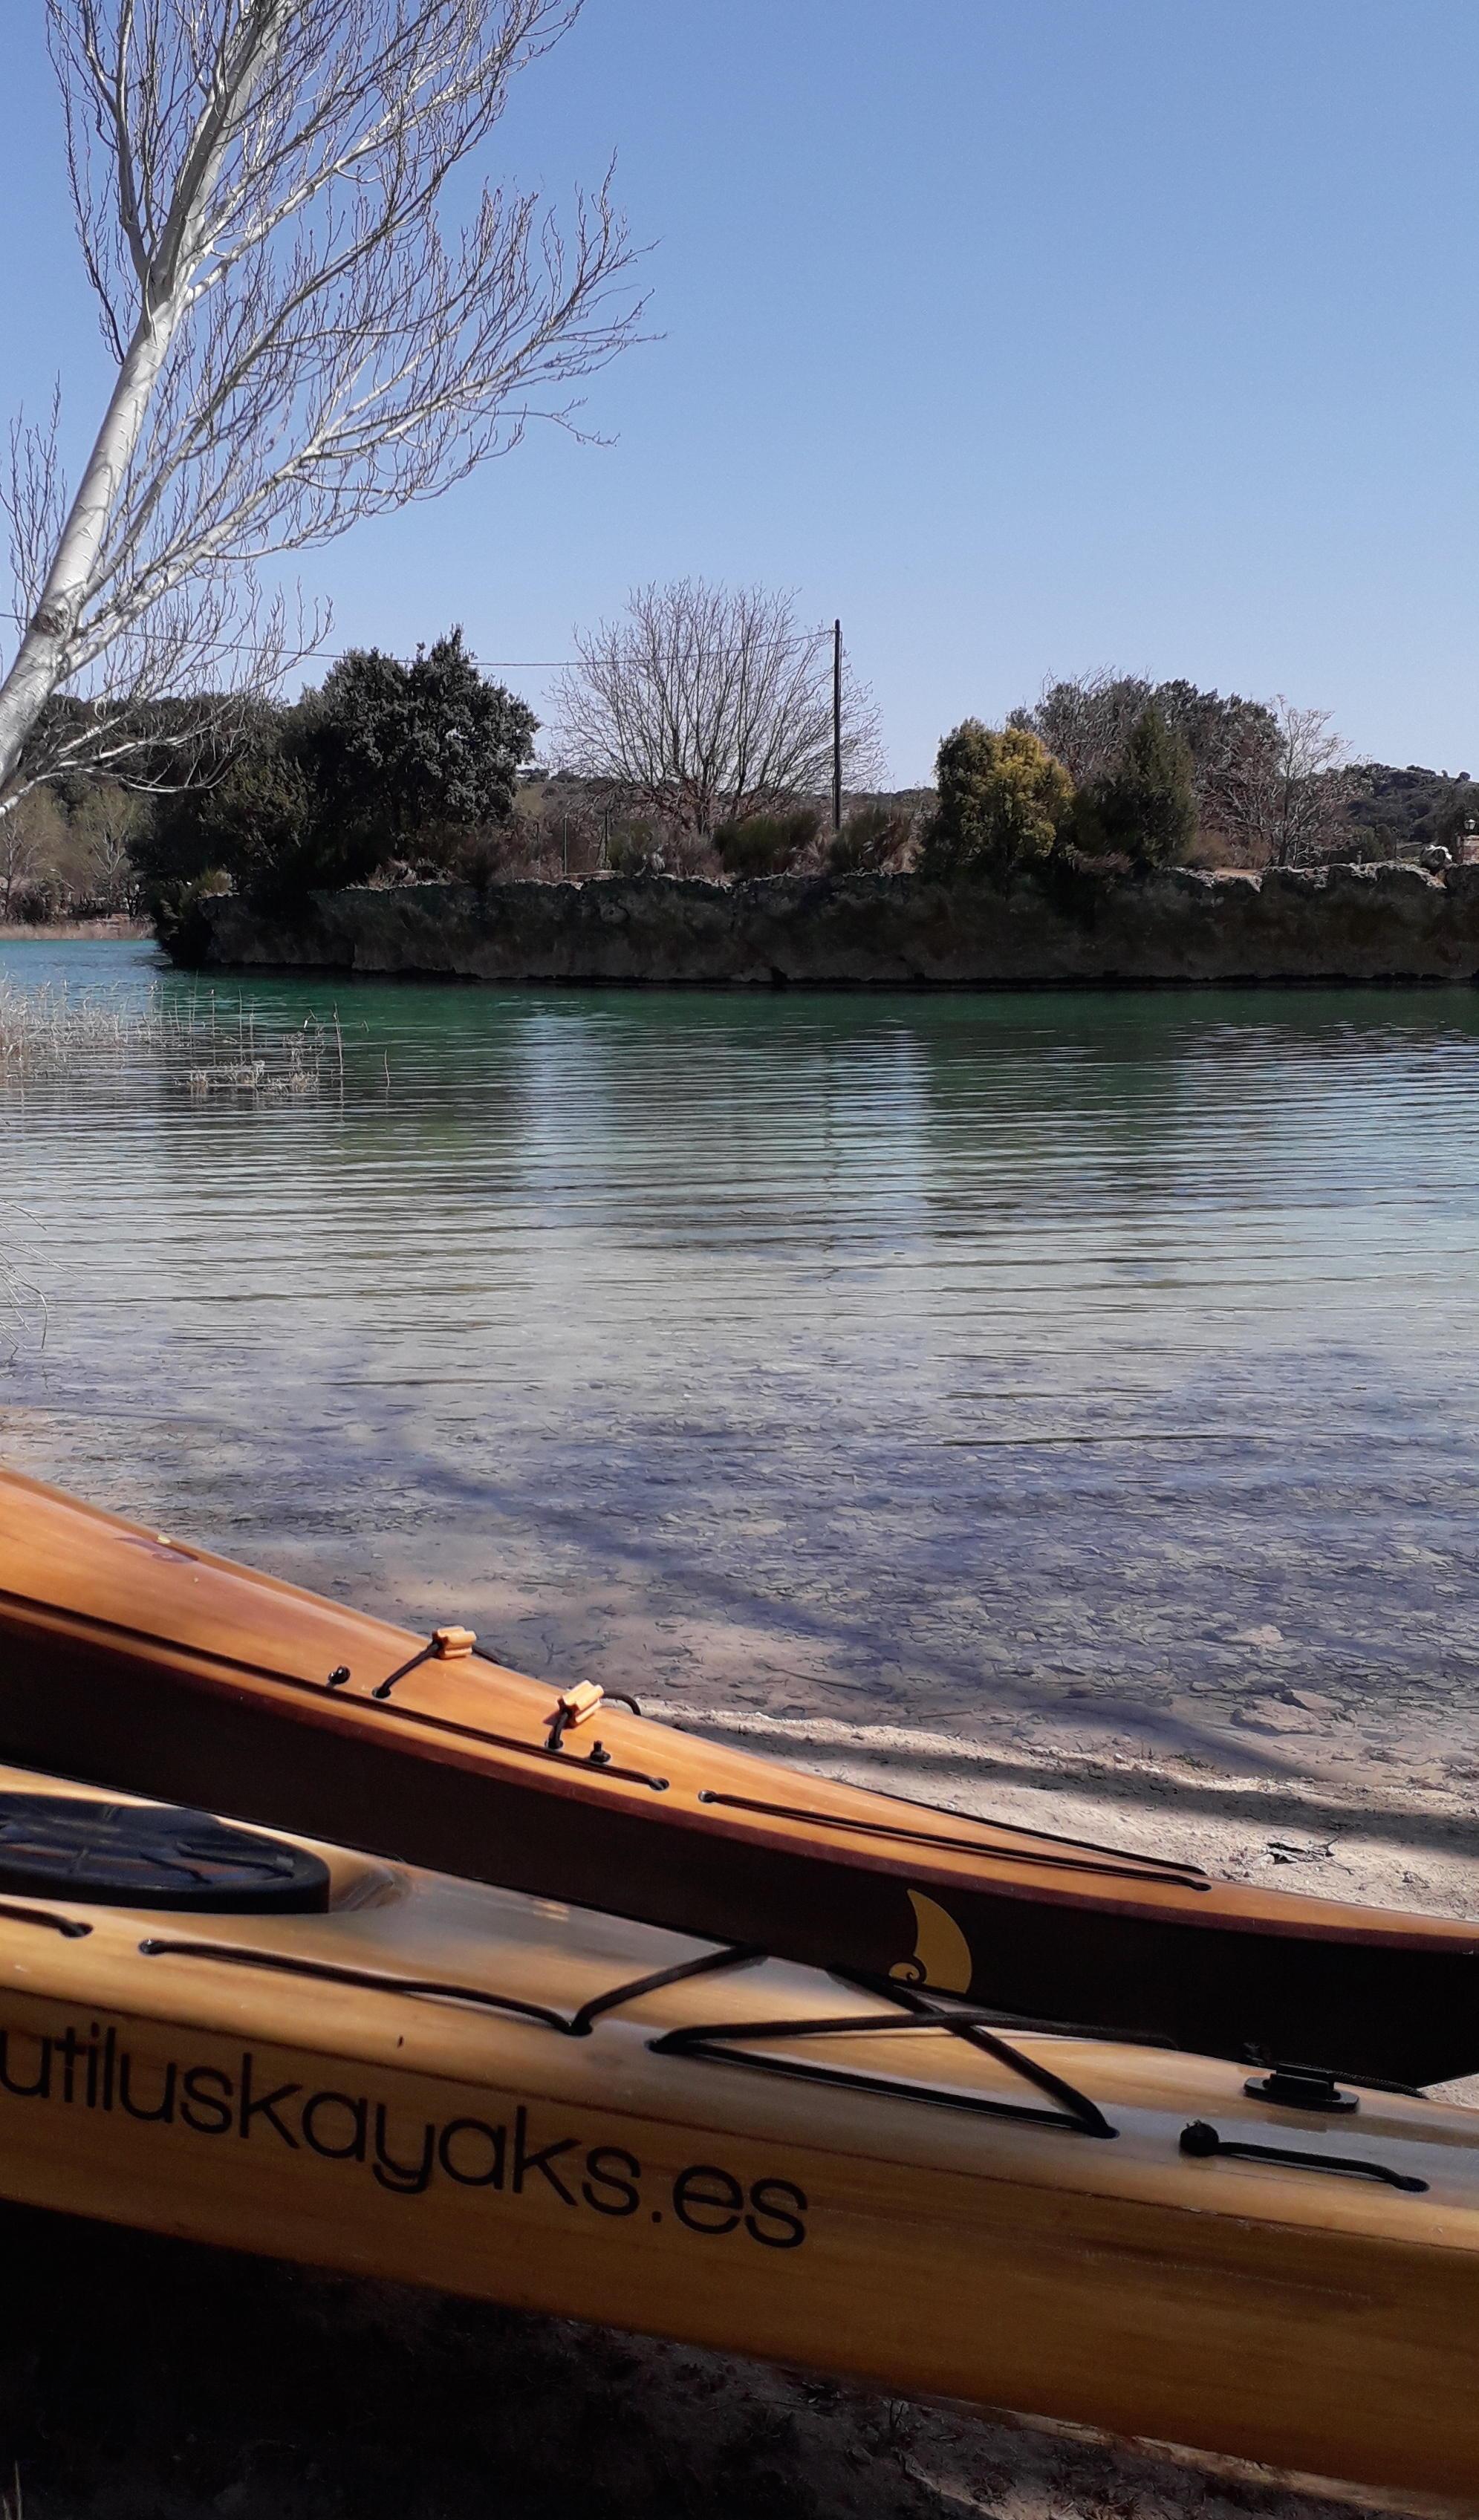 nautilus kayaks de madera lagunas de ruidera 6